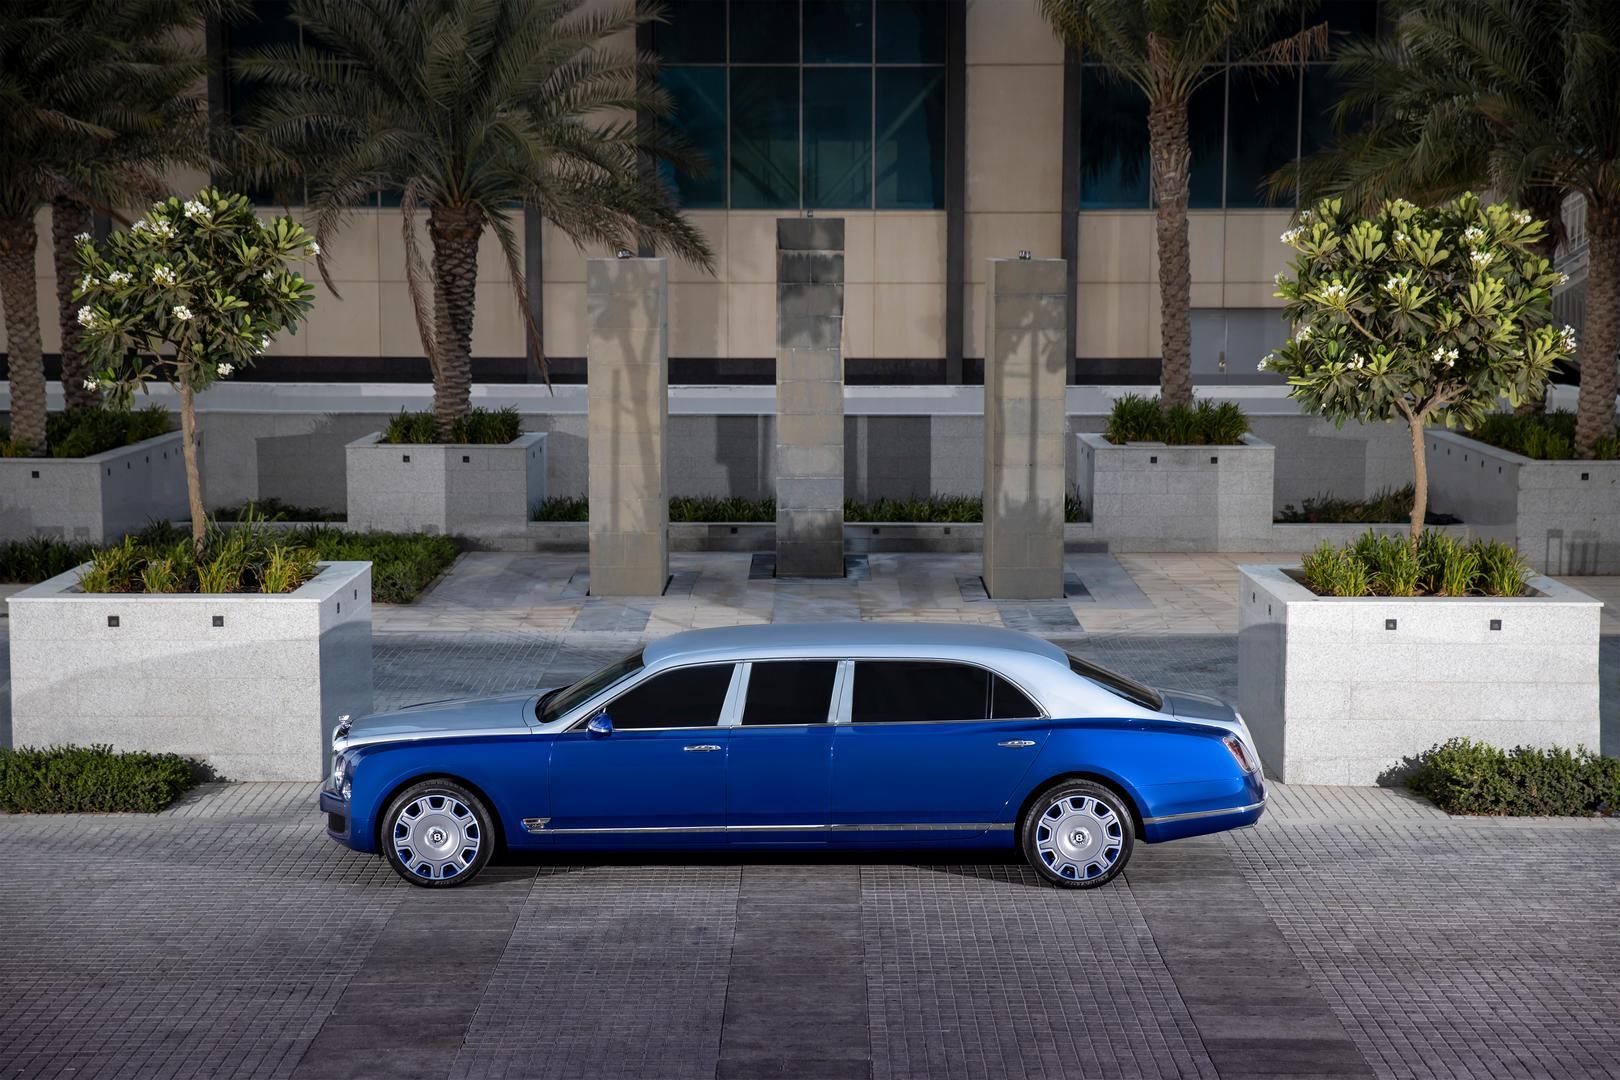 Bentley Mulsanne Grand Limousine side